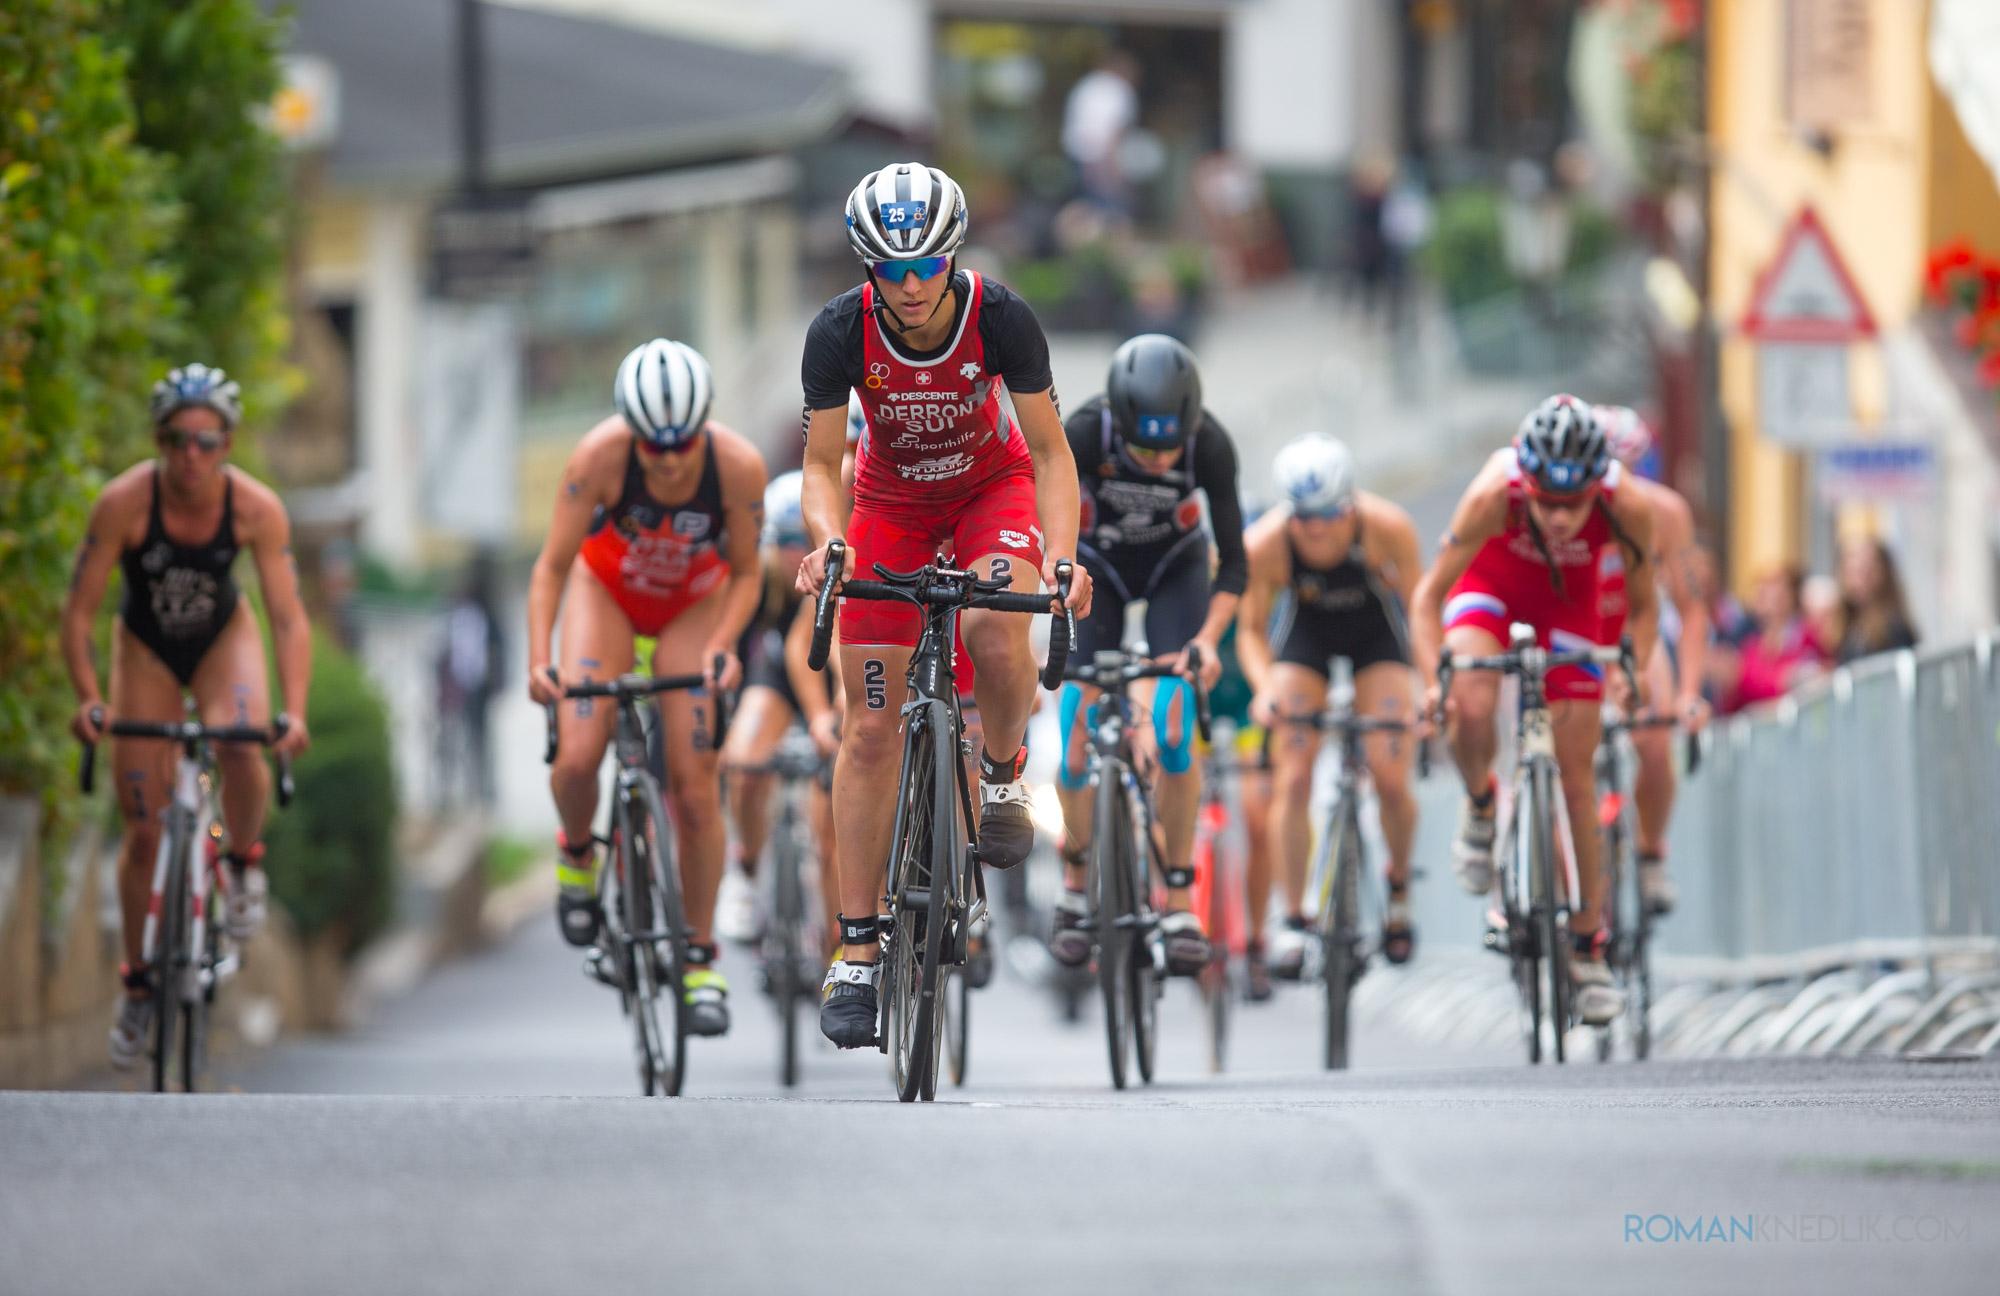 ICU_World_Cup_Triathlon_KV-17